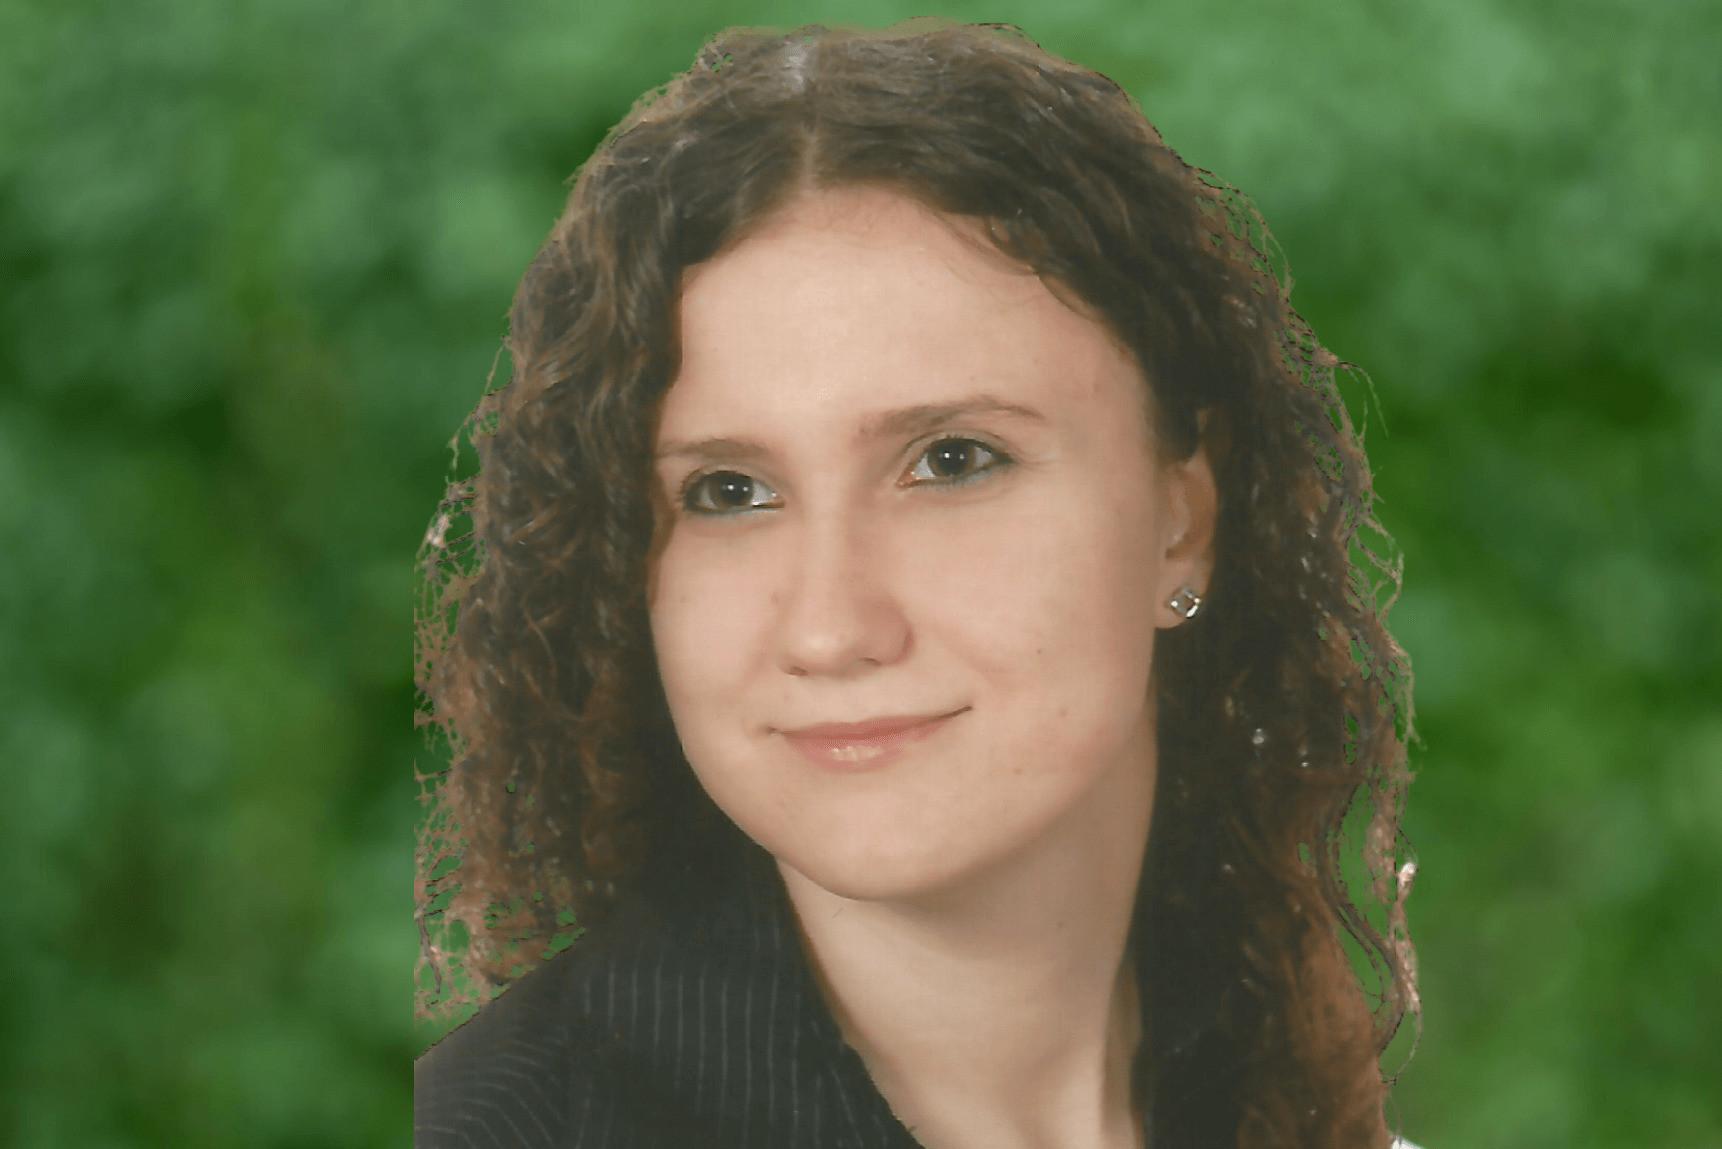 Małgorzata Alboszta